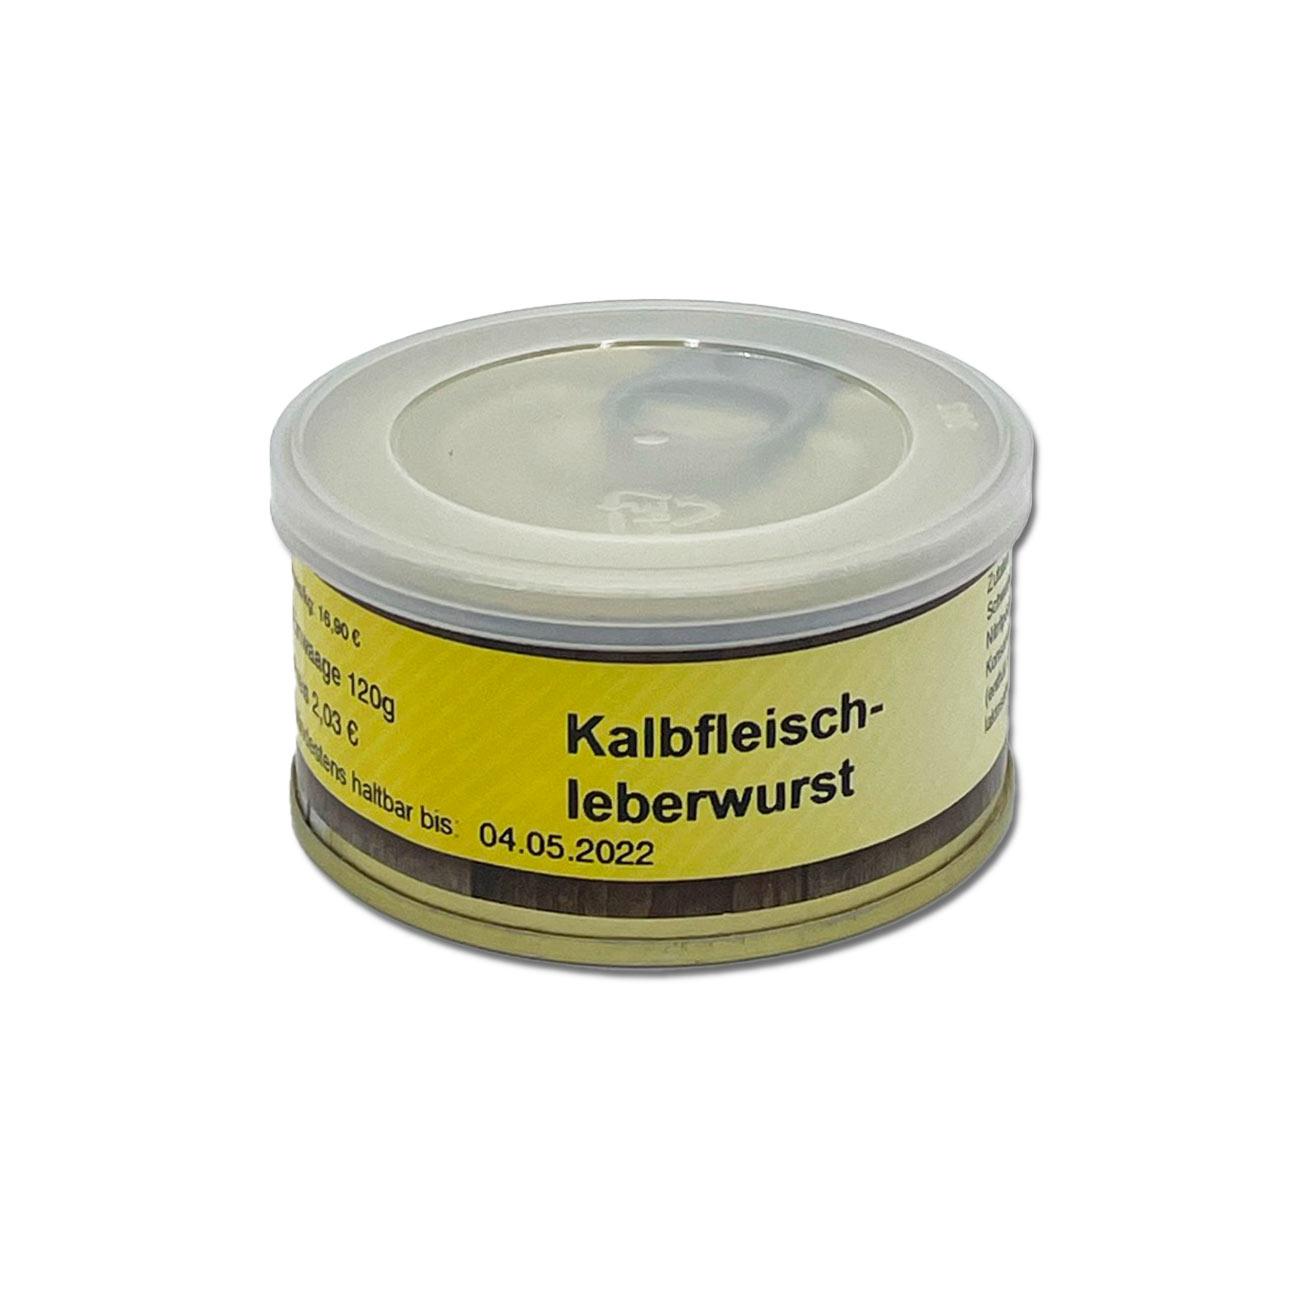 Paket Landjäger, Kalbsleberwurst und Remstaler Klassiksenf